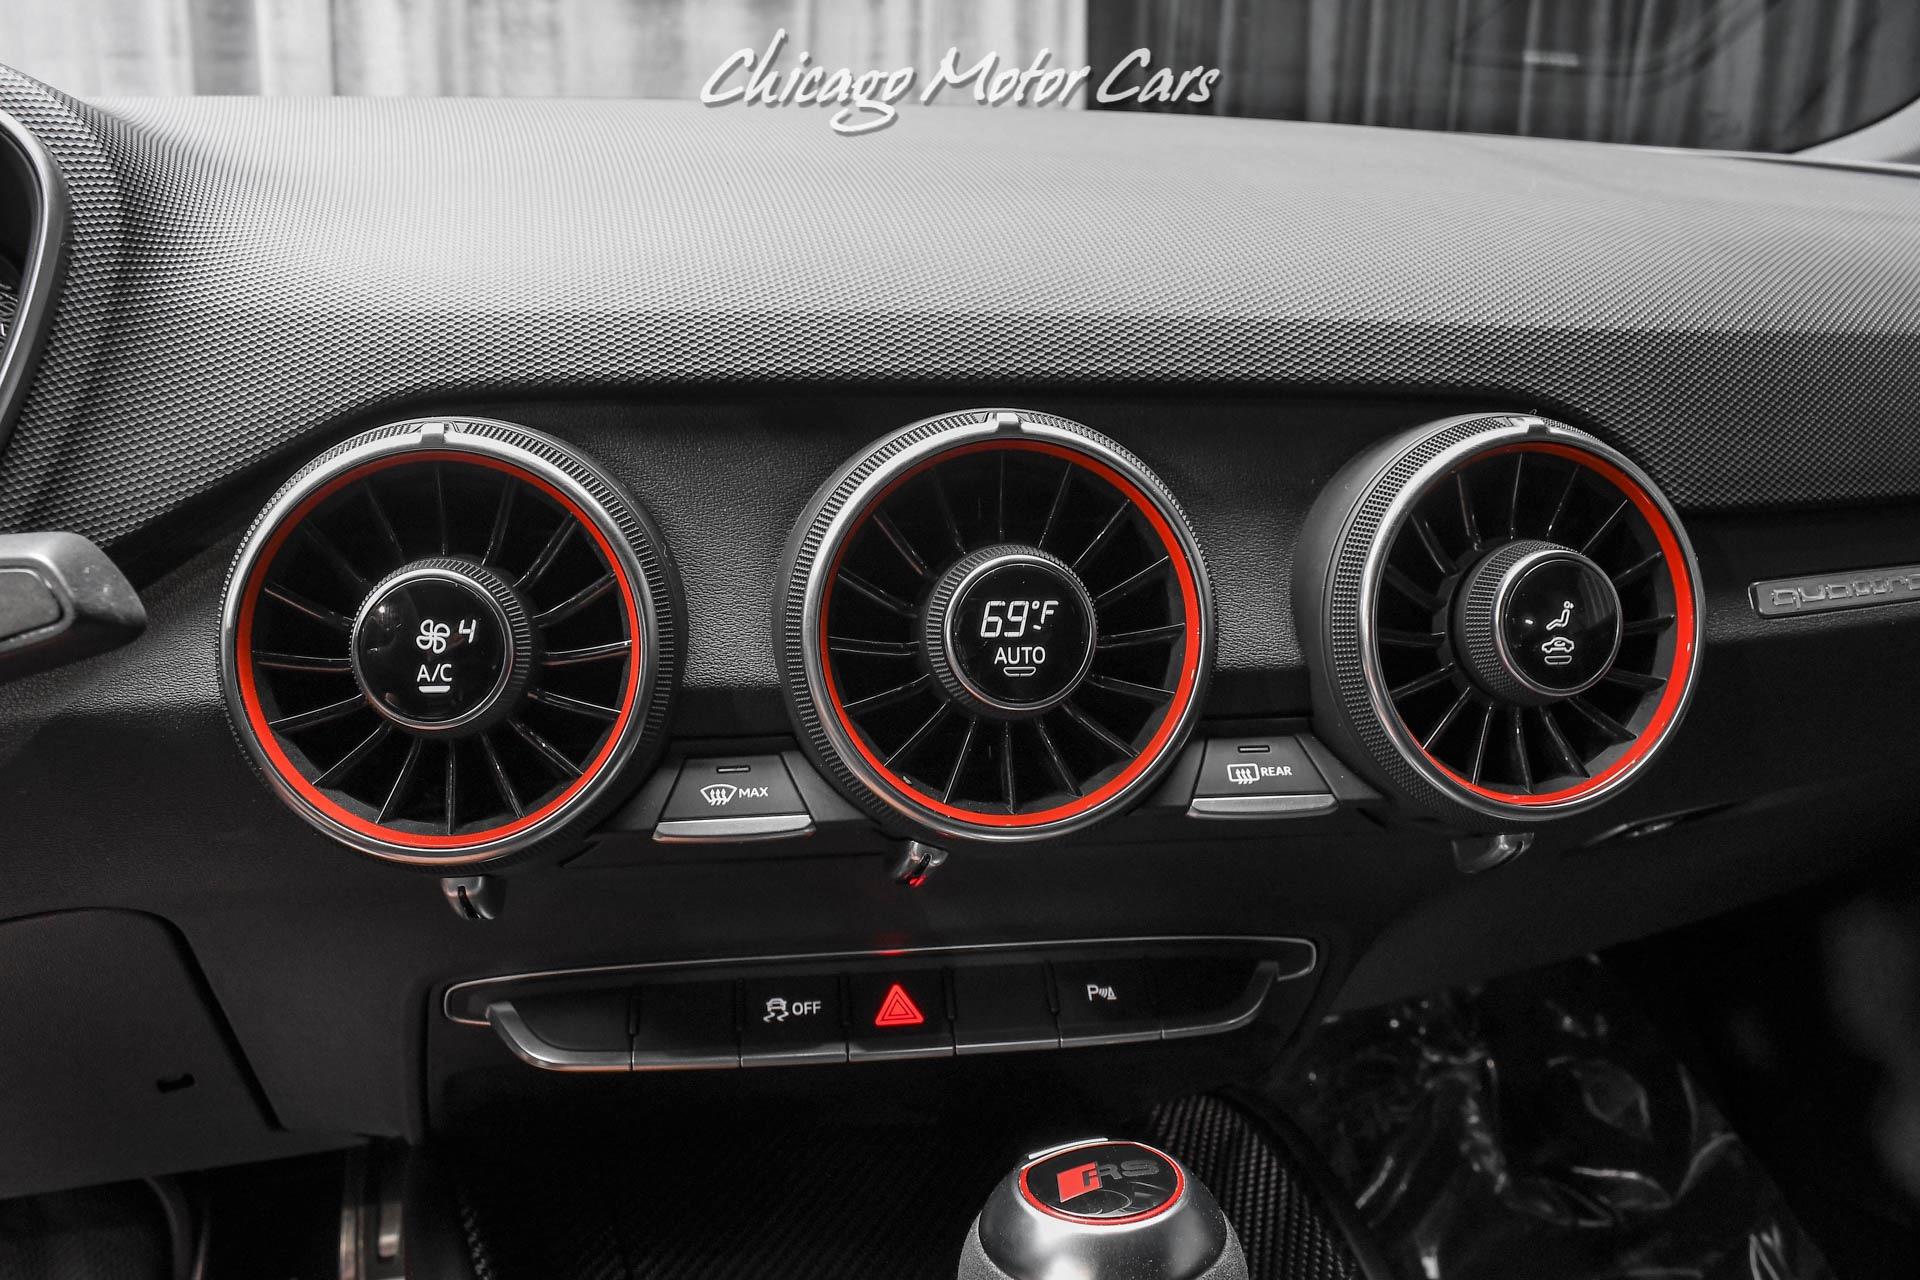 Used-2018-Audi-TT-RS-25T-quattro-Technology-Package-Rare-Nardo-Grey-Carbon-Fiber